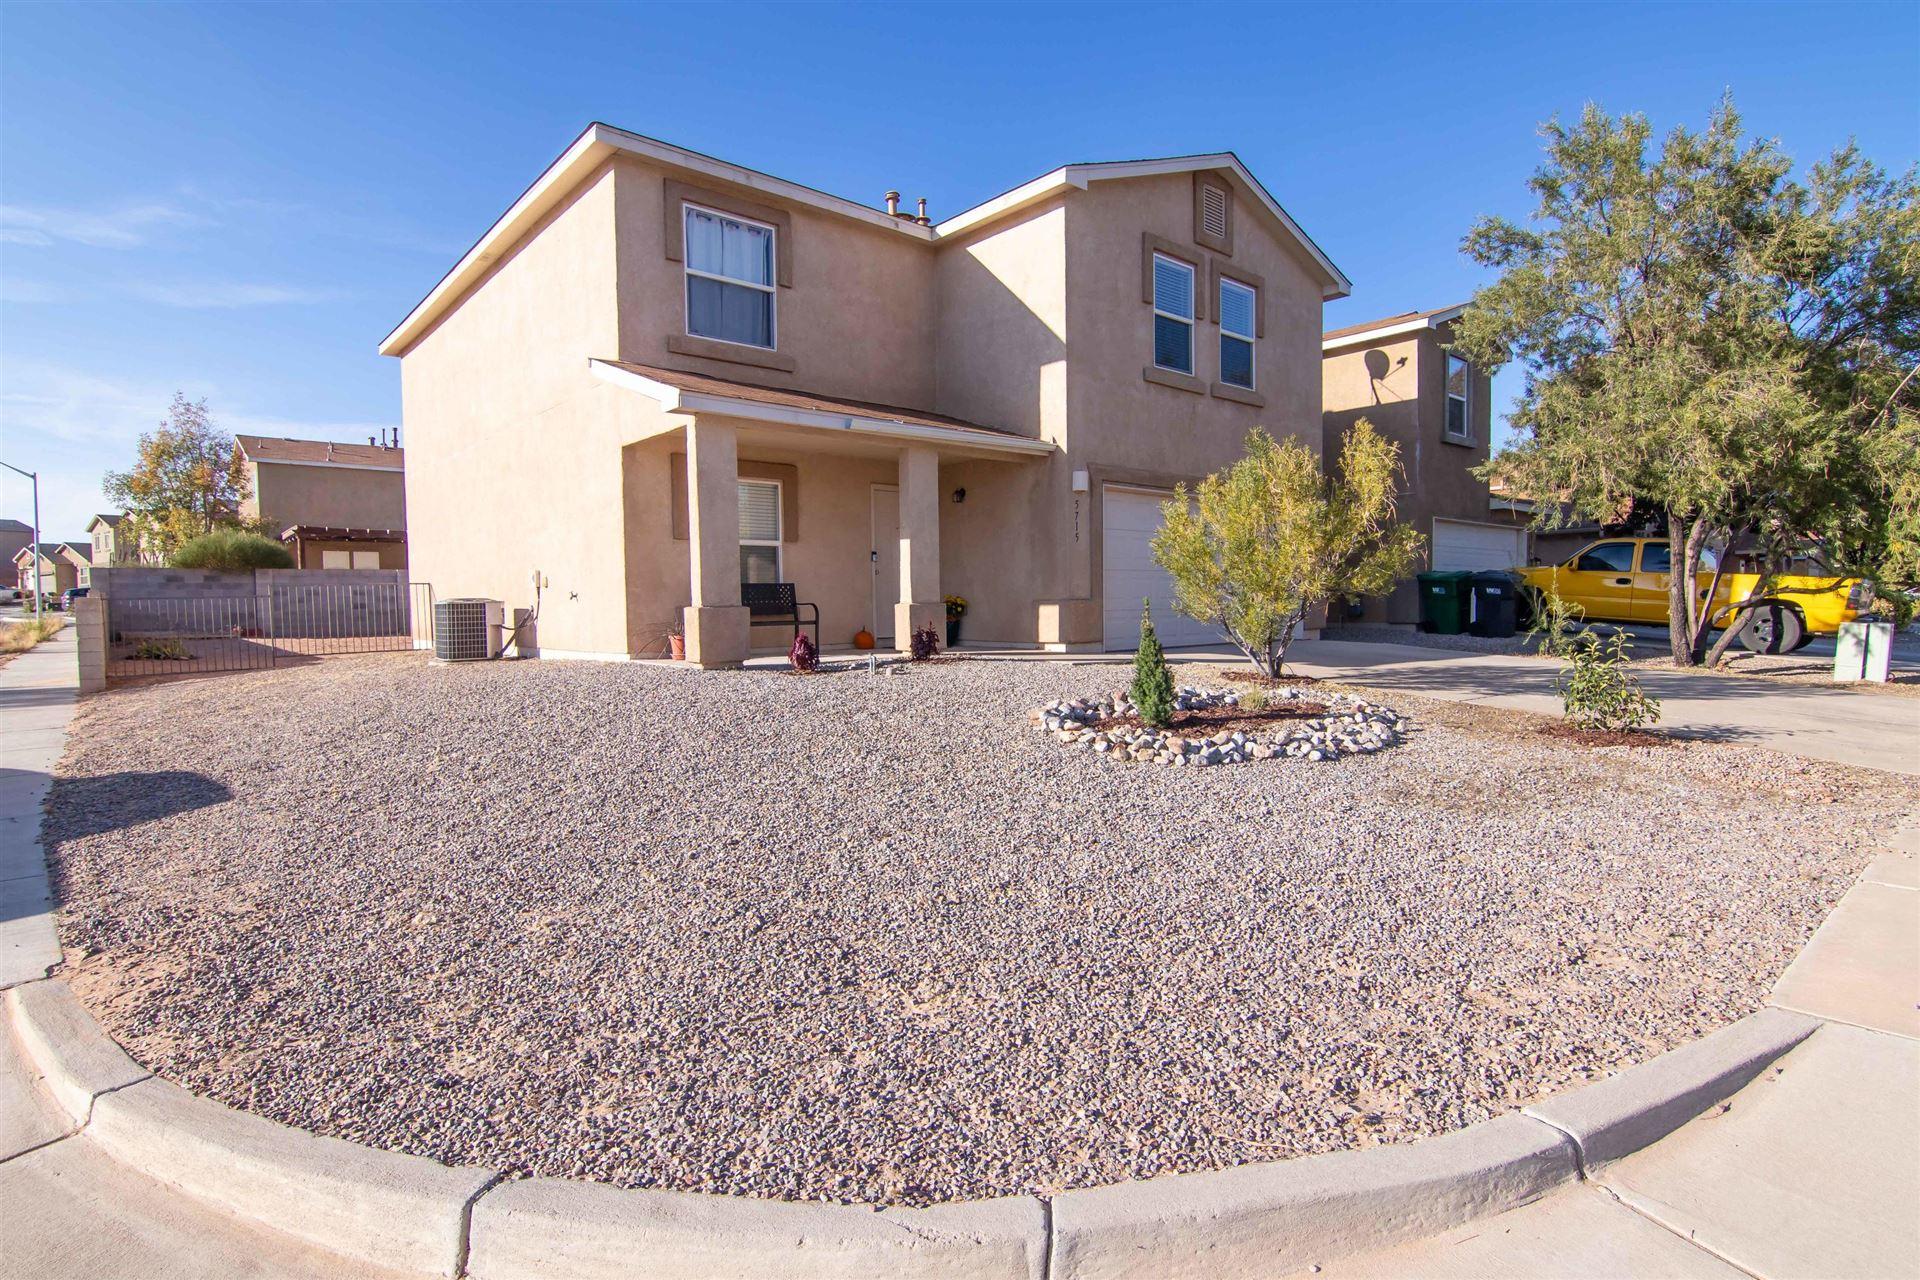 Photo of 5715 CIBOLA Drive NE, Rio Rancho, NM 87144 (MLS # 979736)